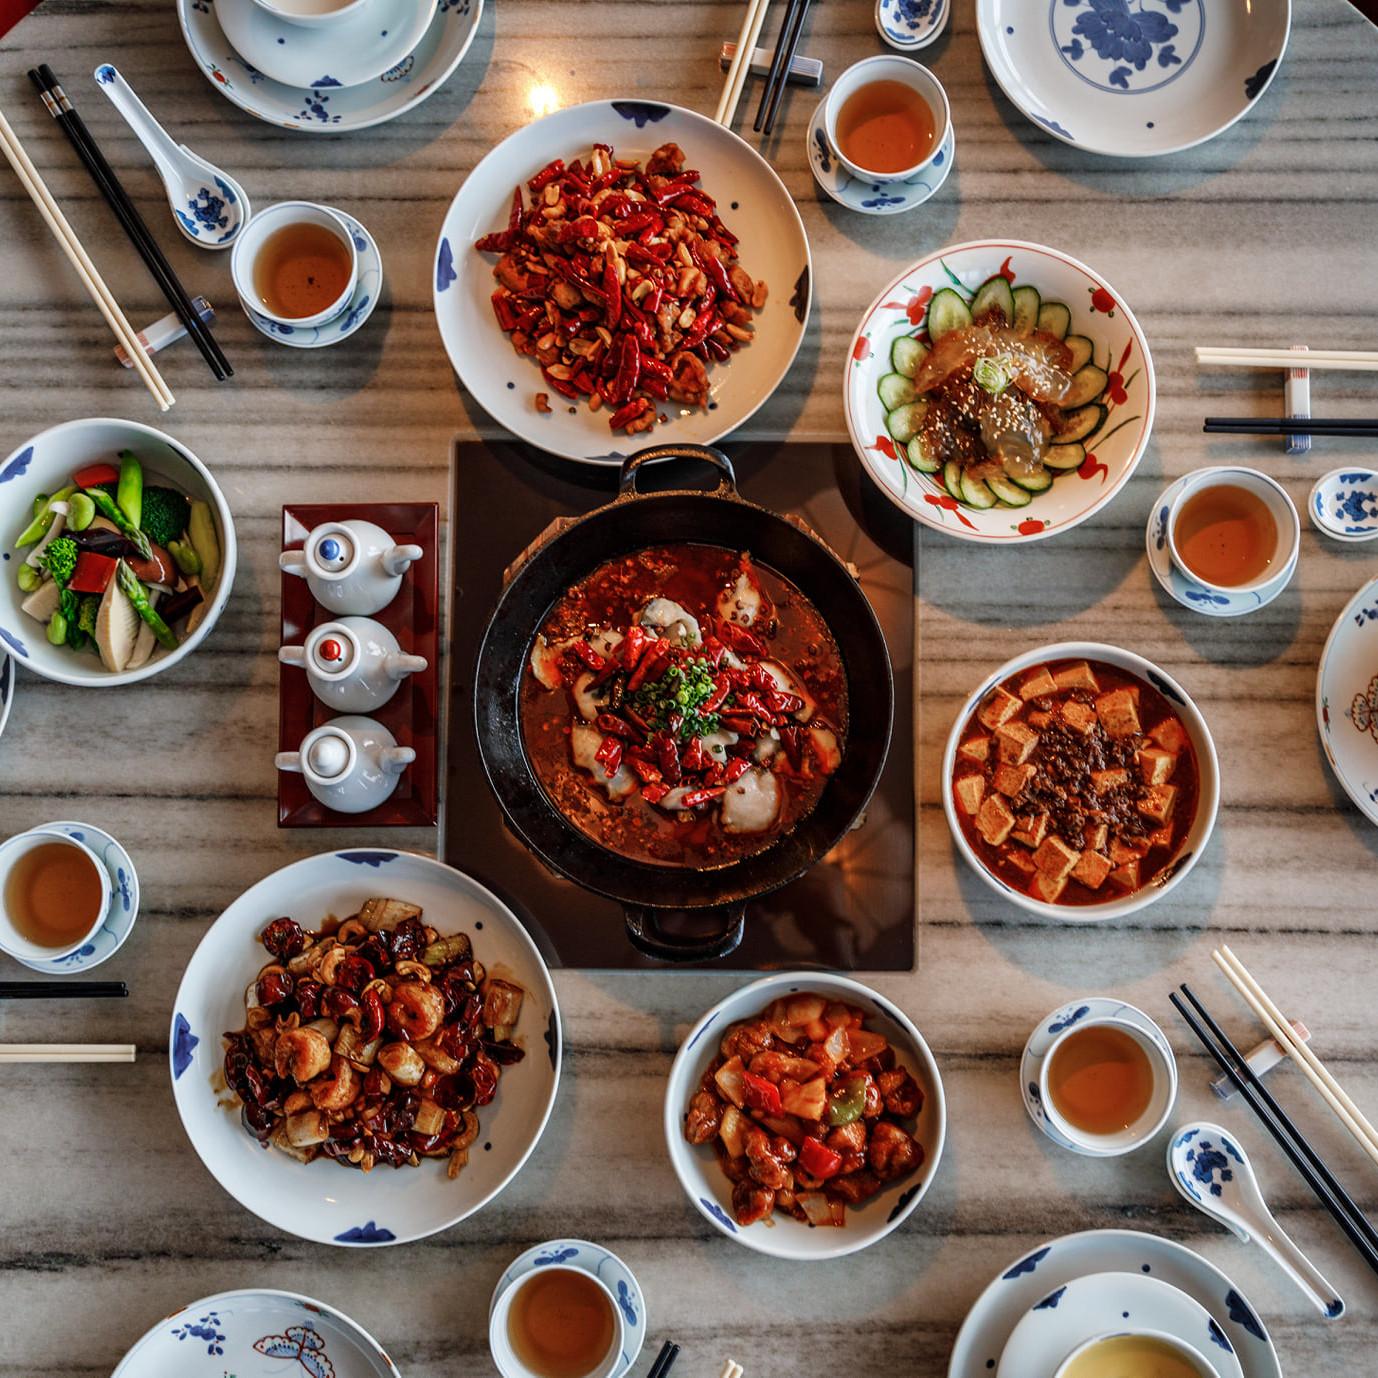 Park Hyatt China Kitchen